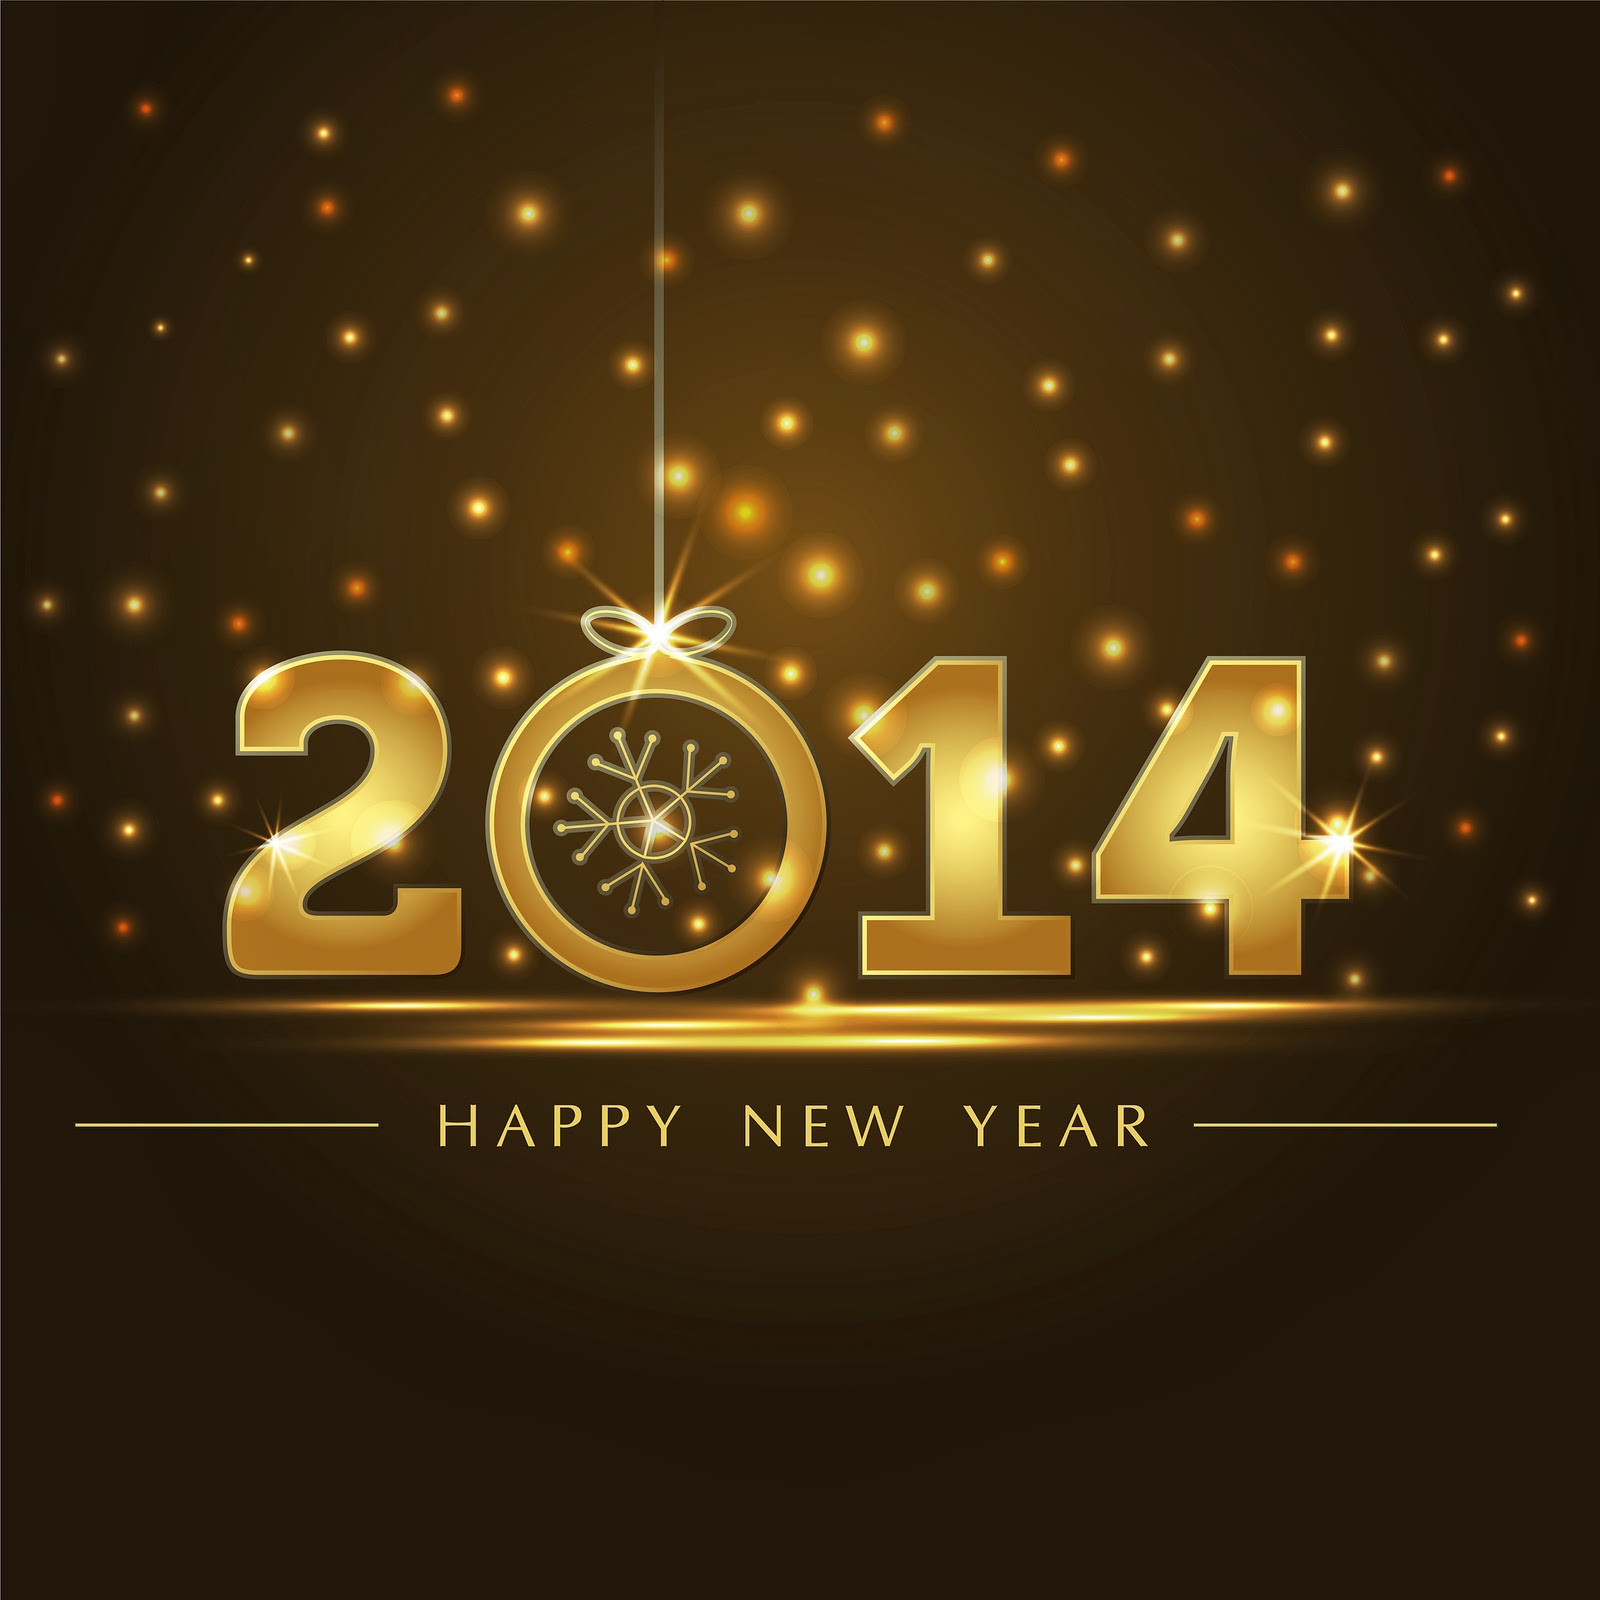 happy new year 2014 julian gooden